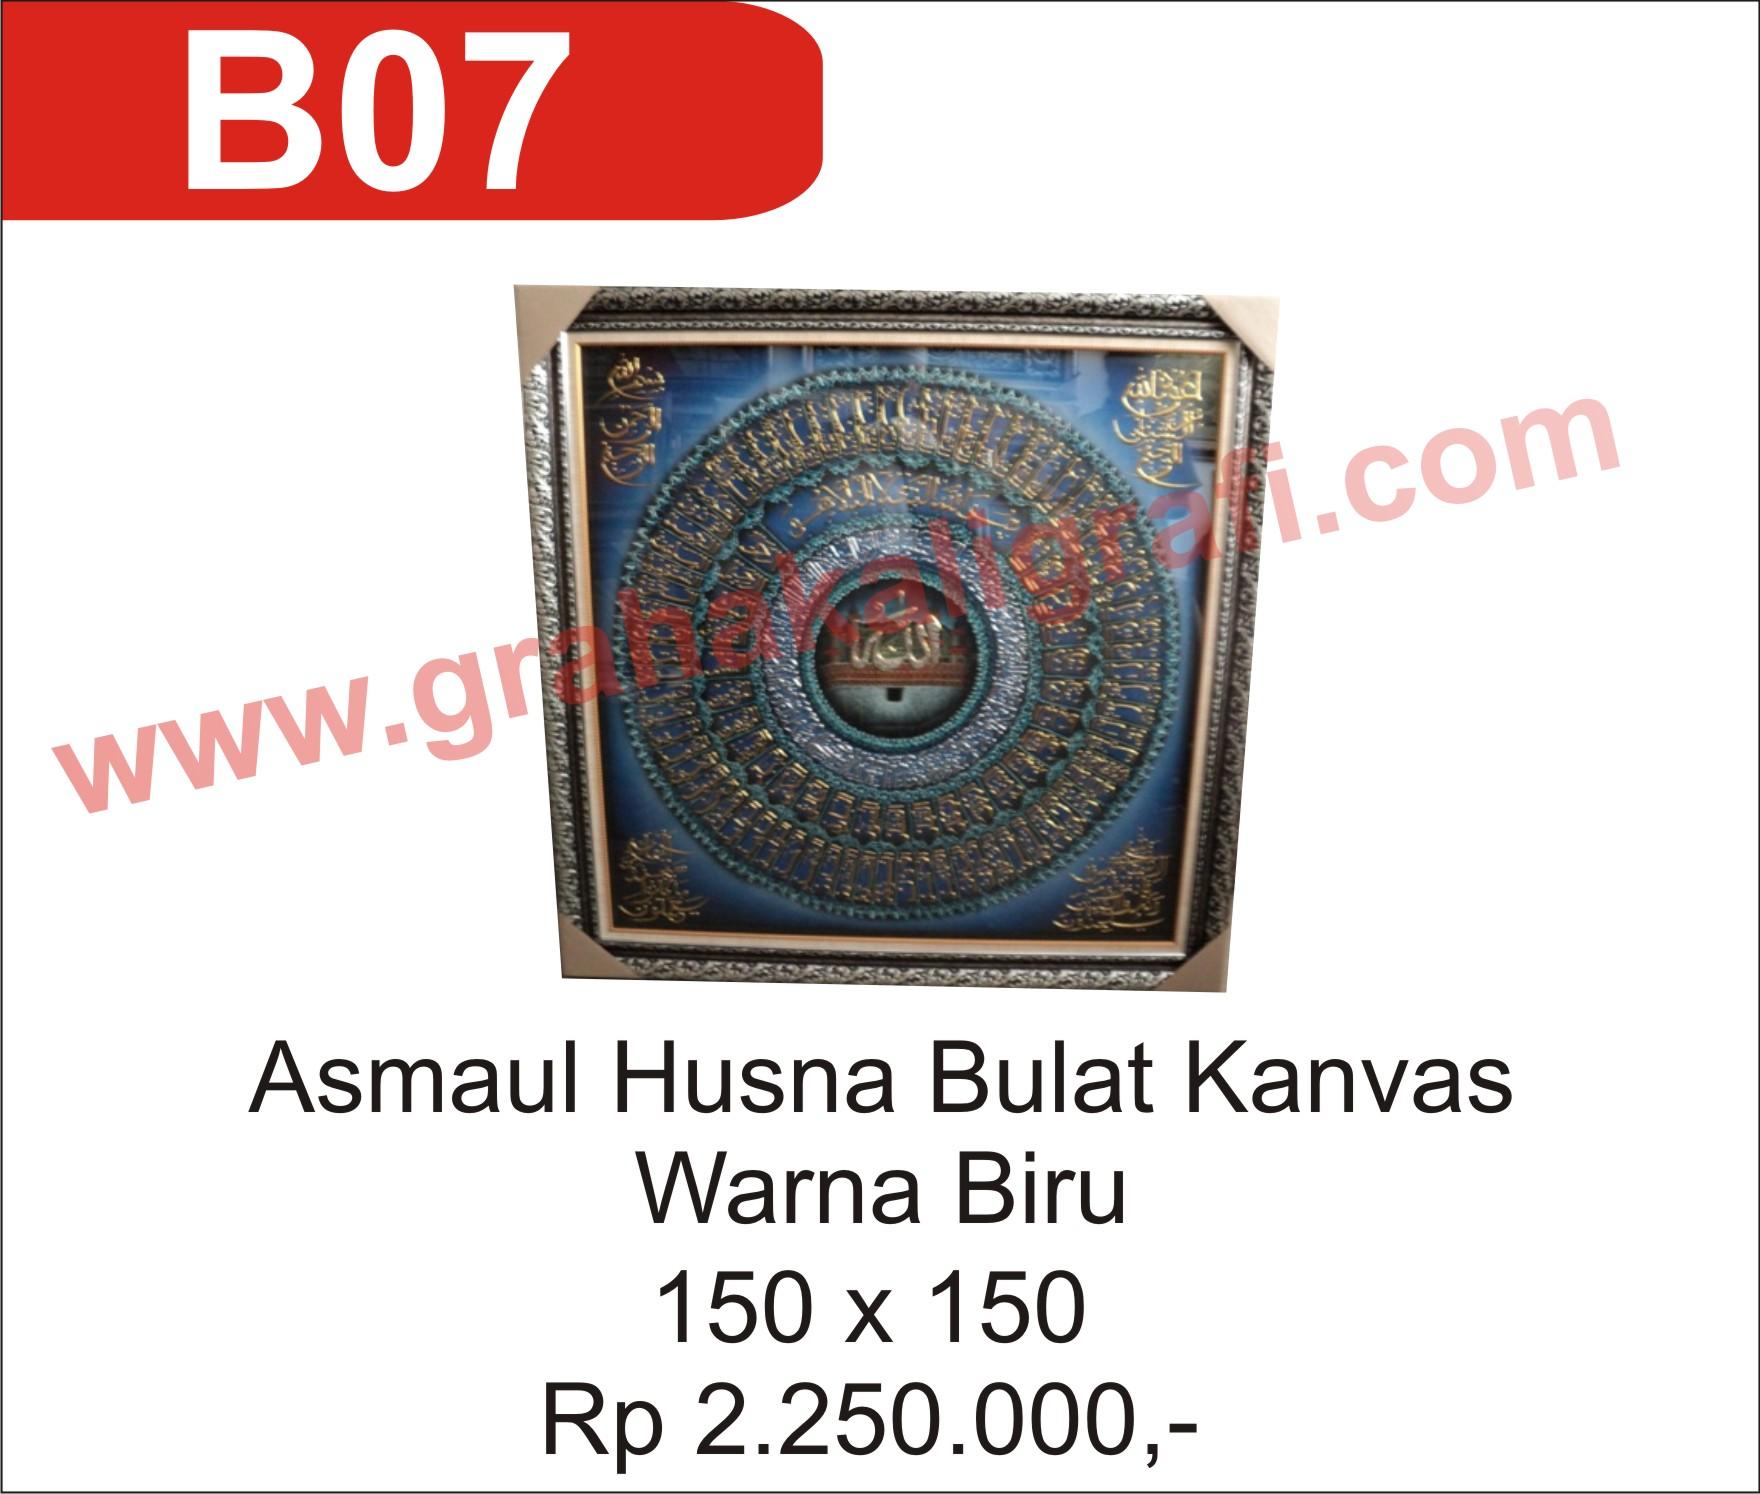 asmaul-husna-bulat-kanvas-warna-biru-graha-kaligrafi-e28093-kaligrafi ...